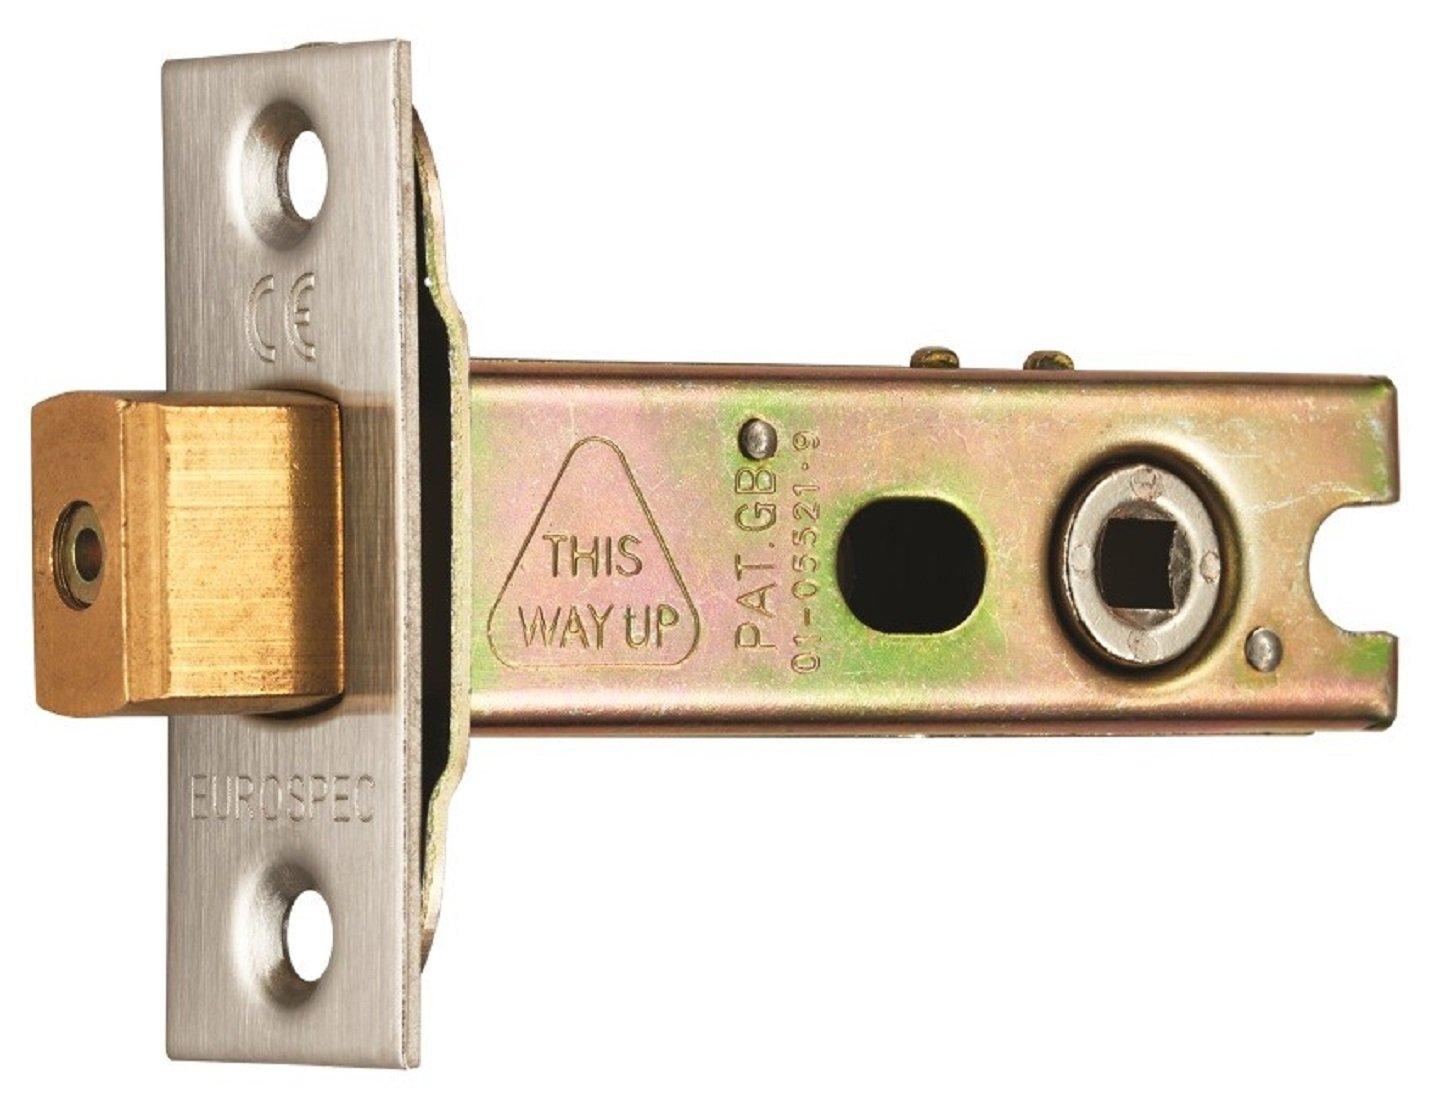 Heavy Duty Eurospec 2.5' (64mm) Tubular Bathroom Dead Bolt TLD5025EB/SSS Eurospec Carlisle Brass